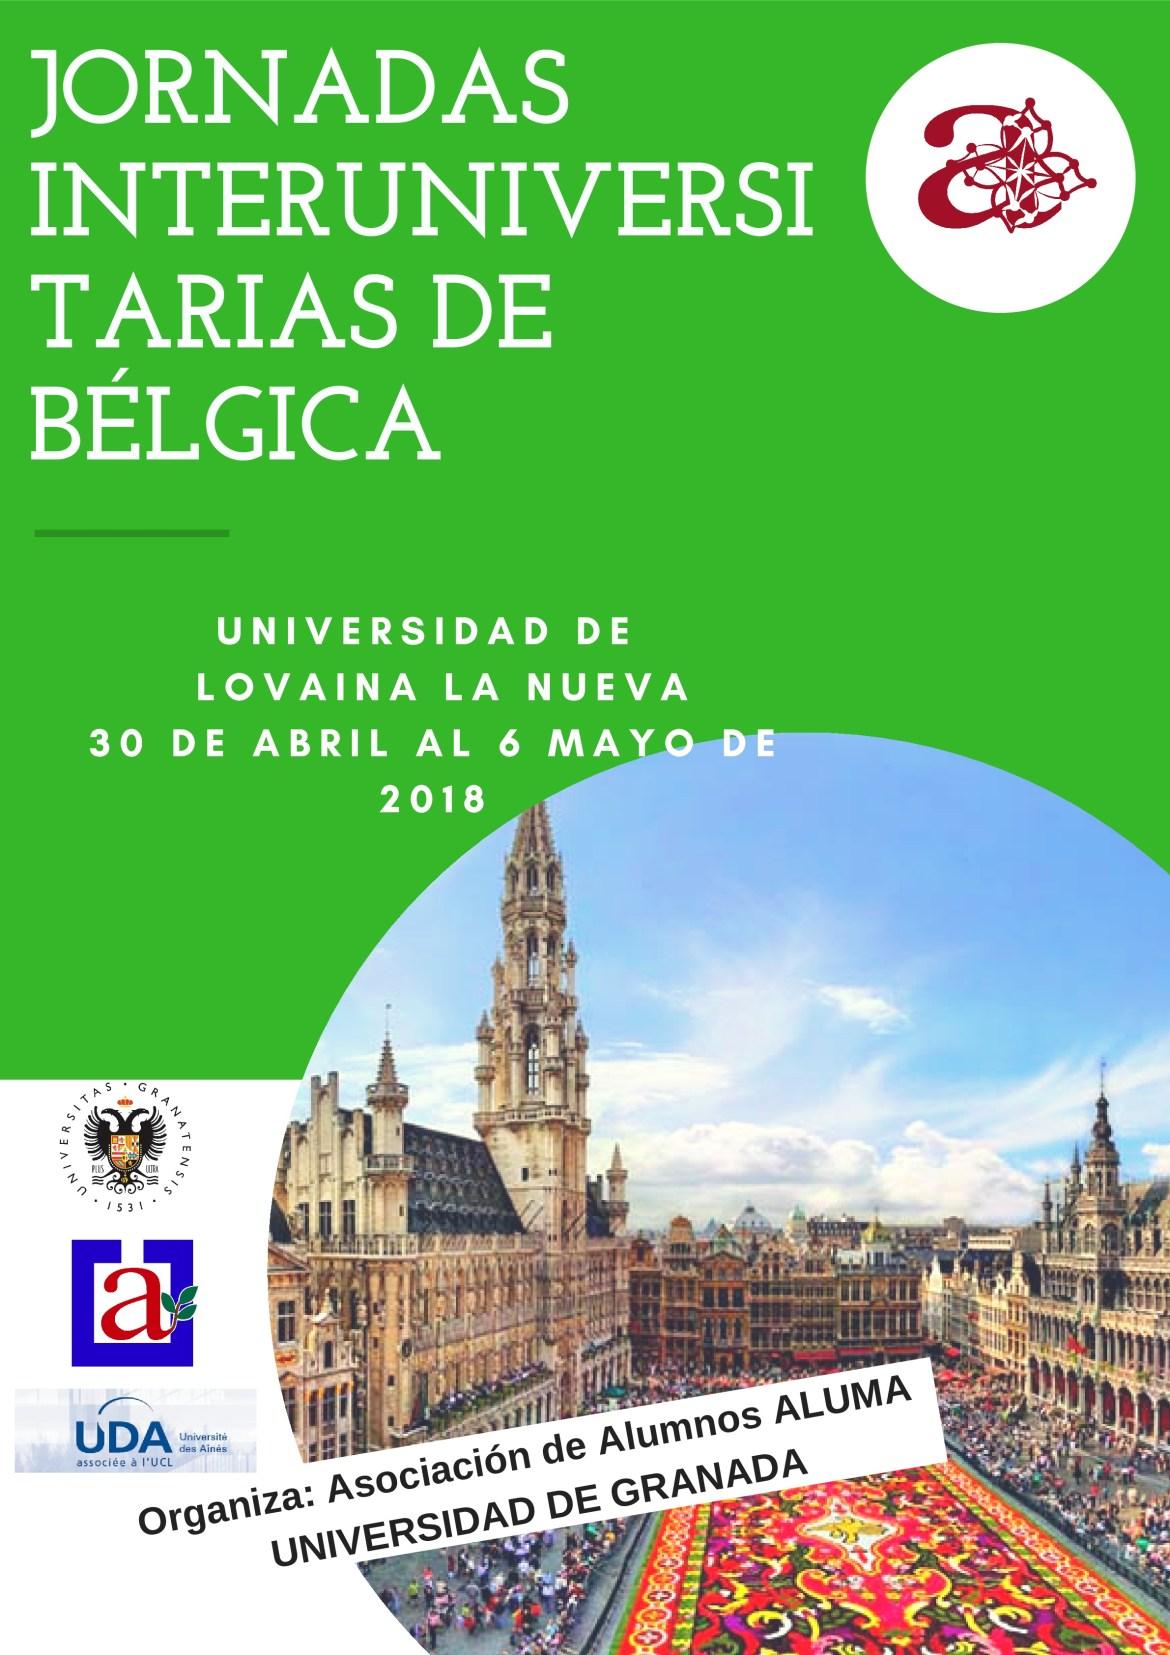 Jornadas Interuniversitarias de Bélgica (5)-001